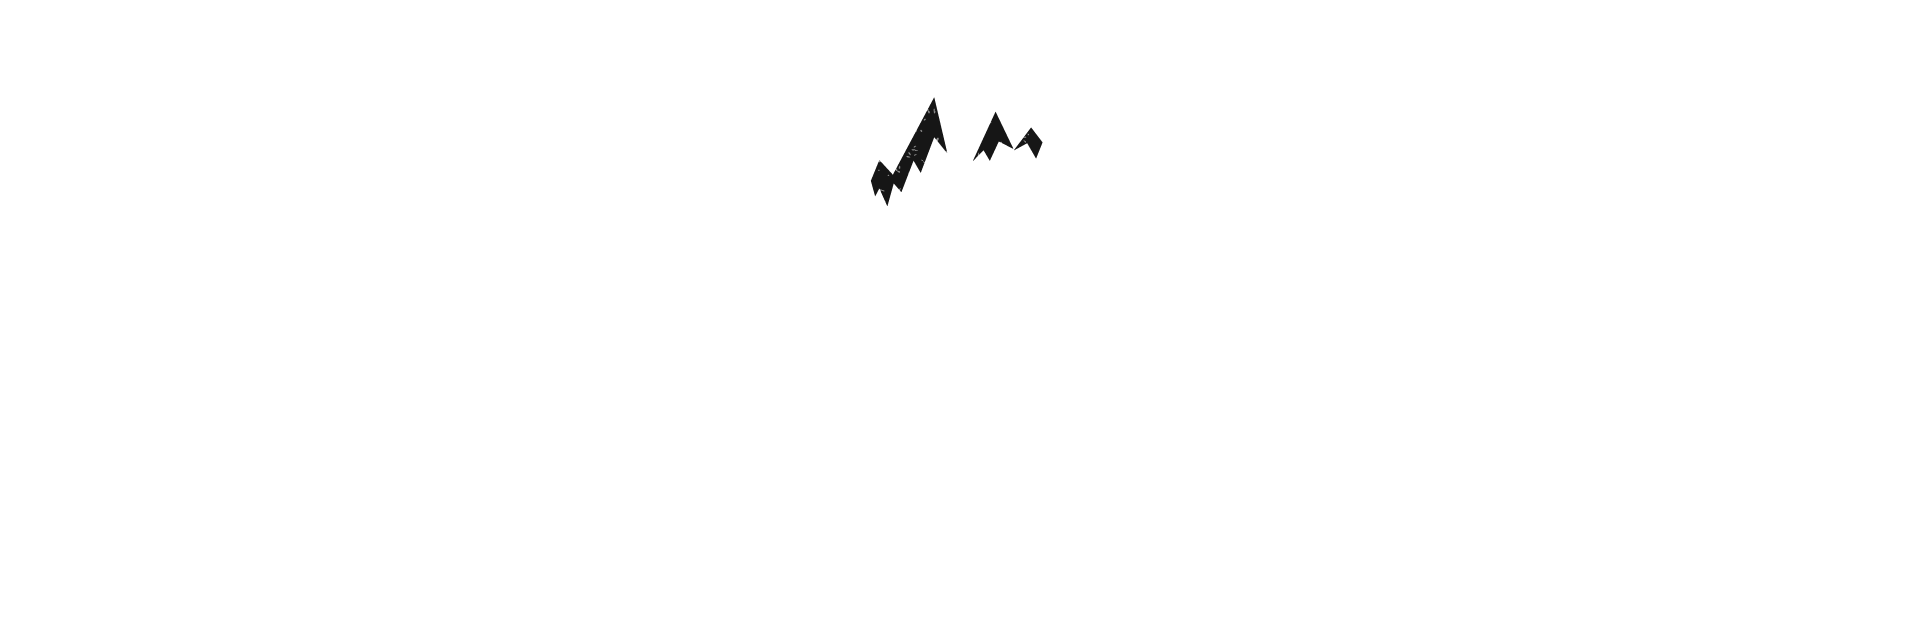 Mens Retreat_2019 Logo-05.png